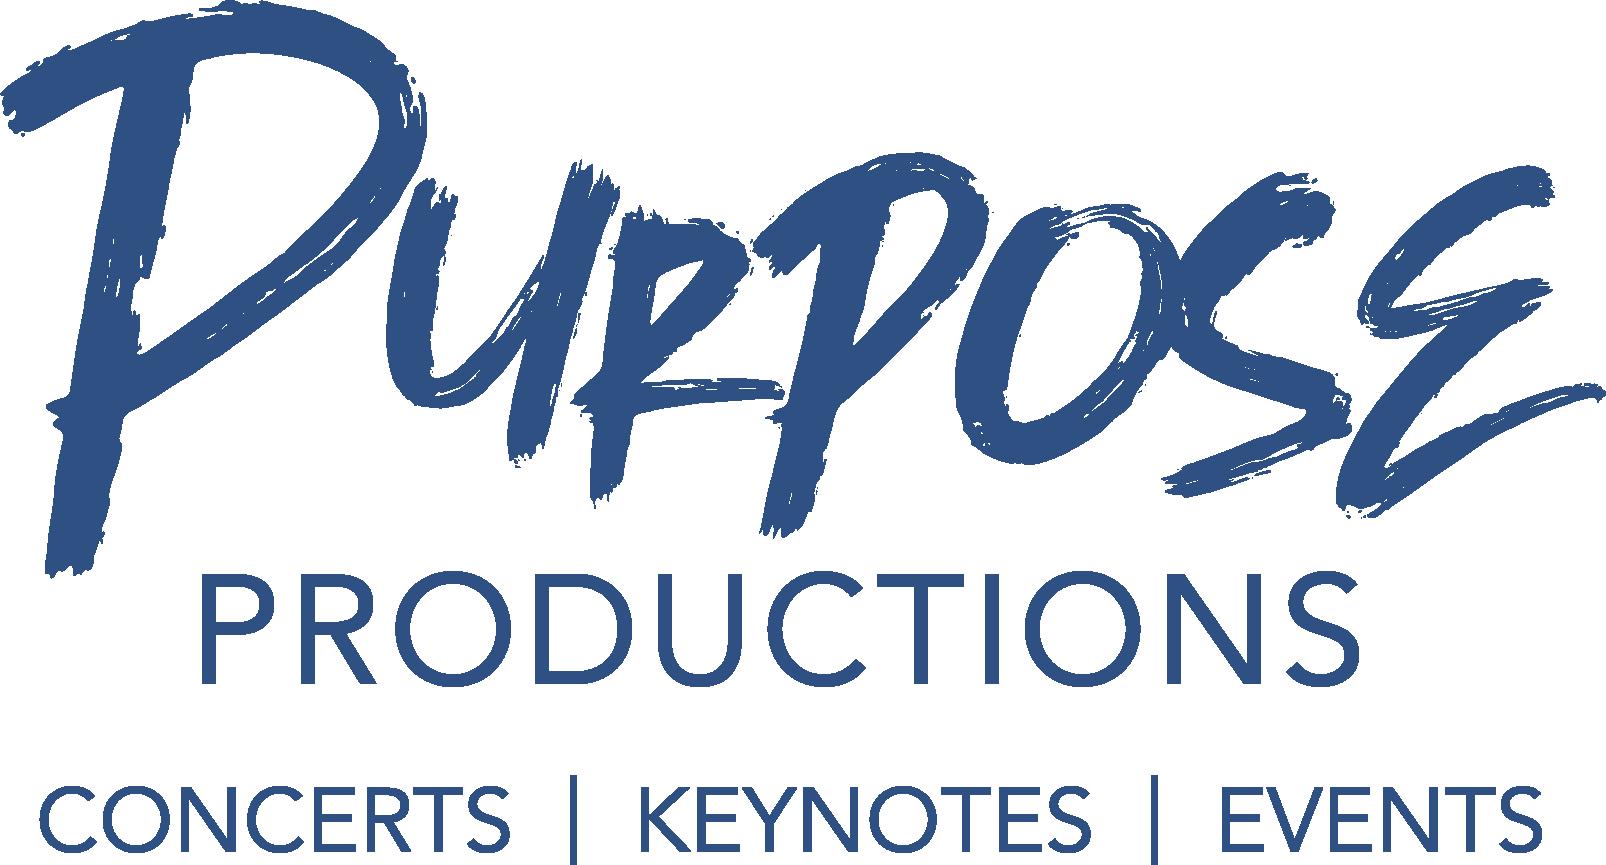 concerts keynotes events